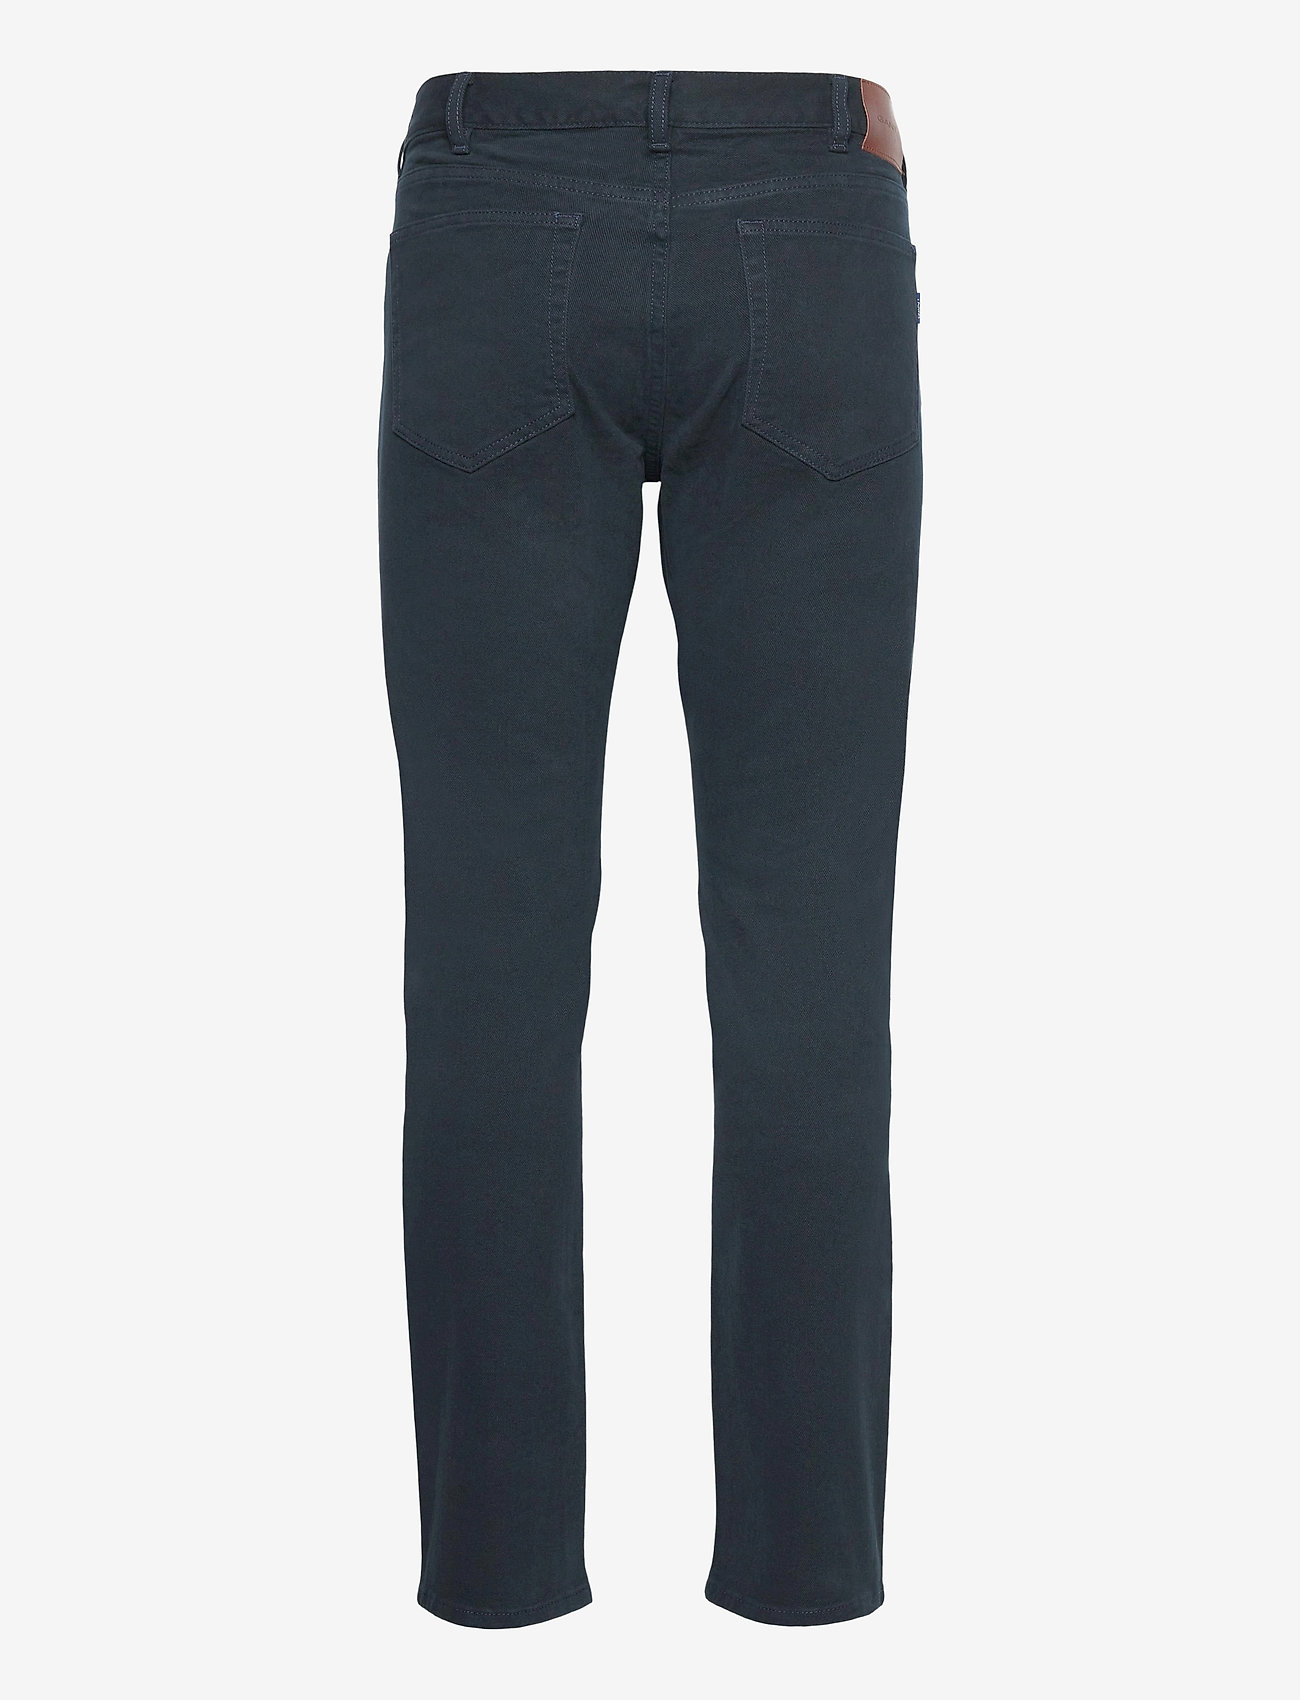 GANT - D2. REGULAR SOFT TWILL JEANS - regular jeans - navy - 1